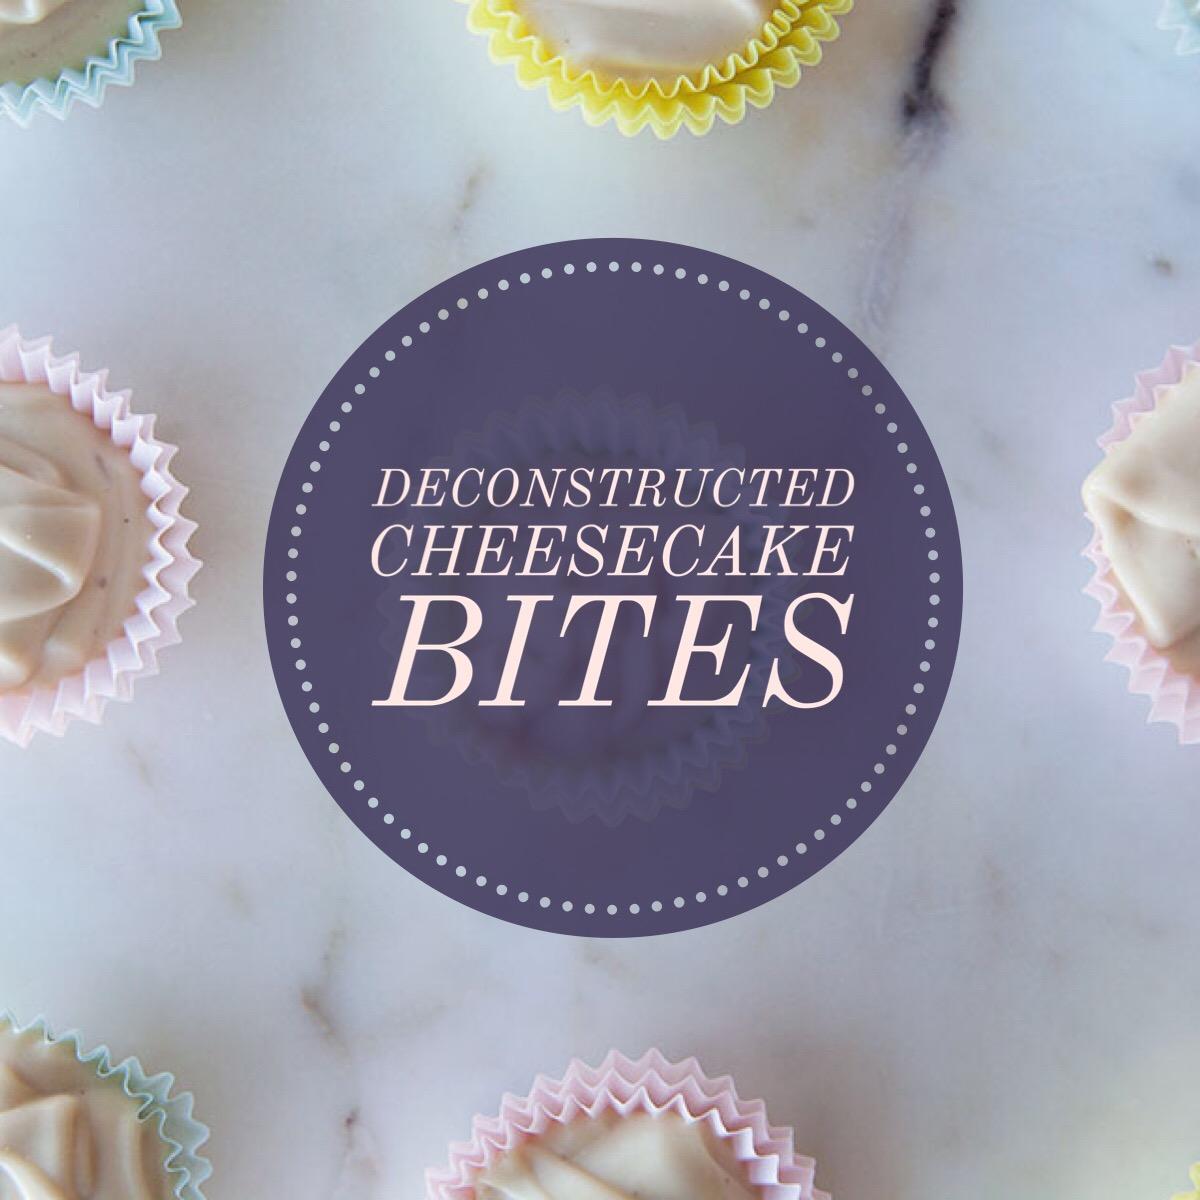 Deconstructed Cheesecake Bites